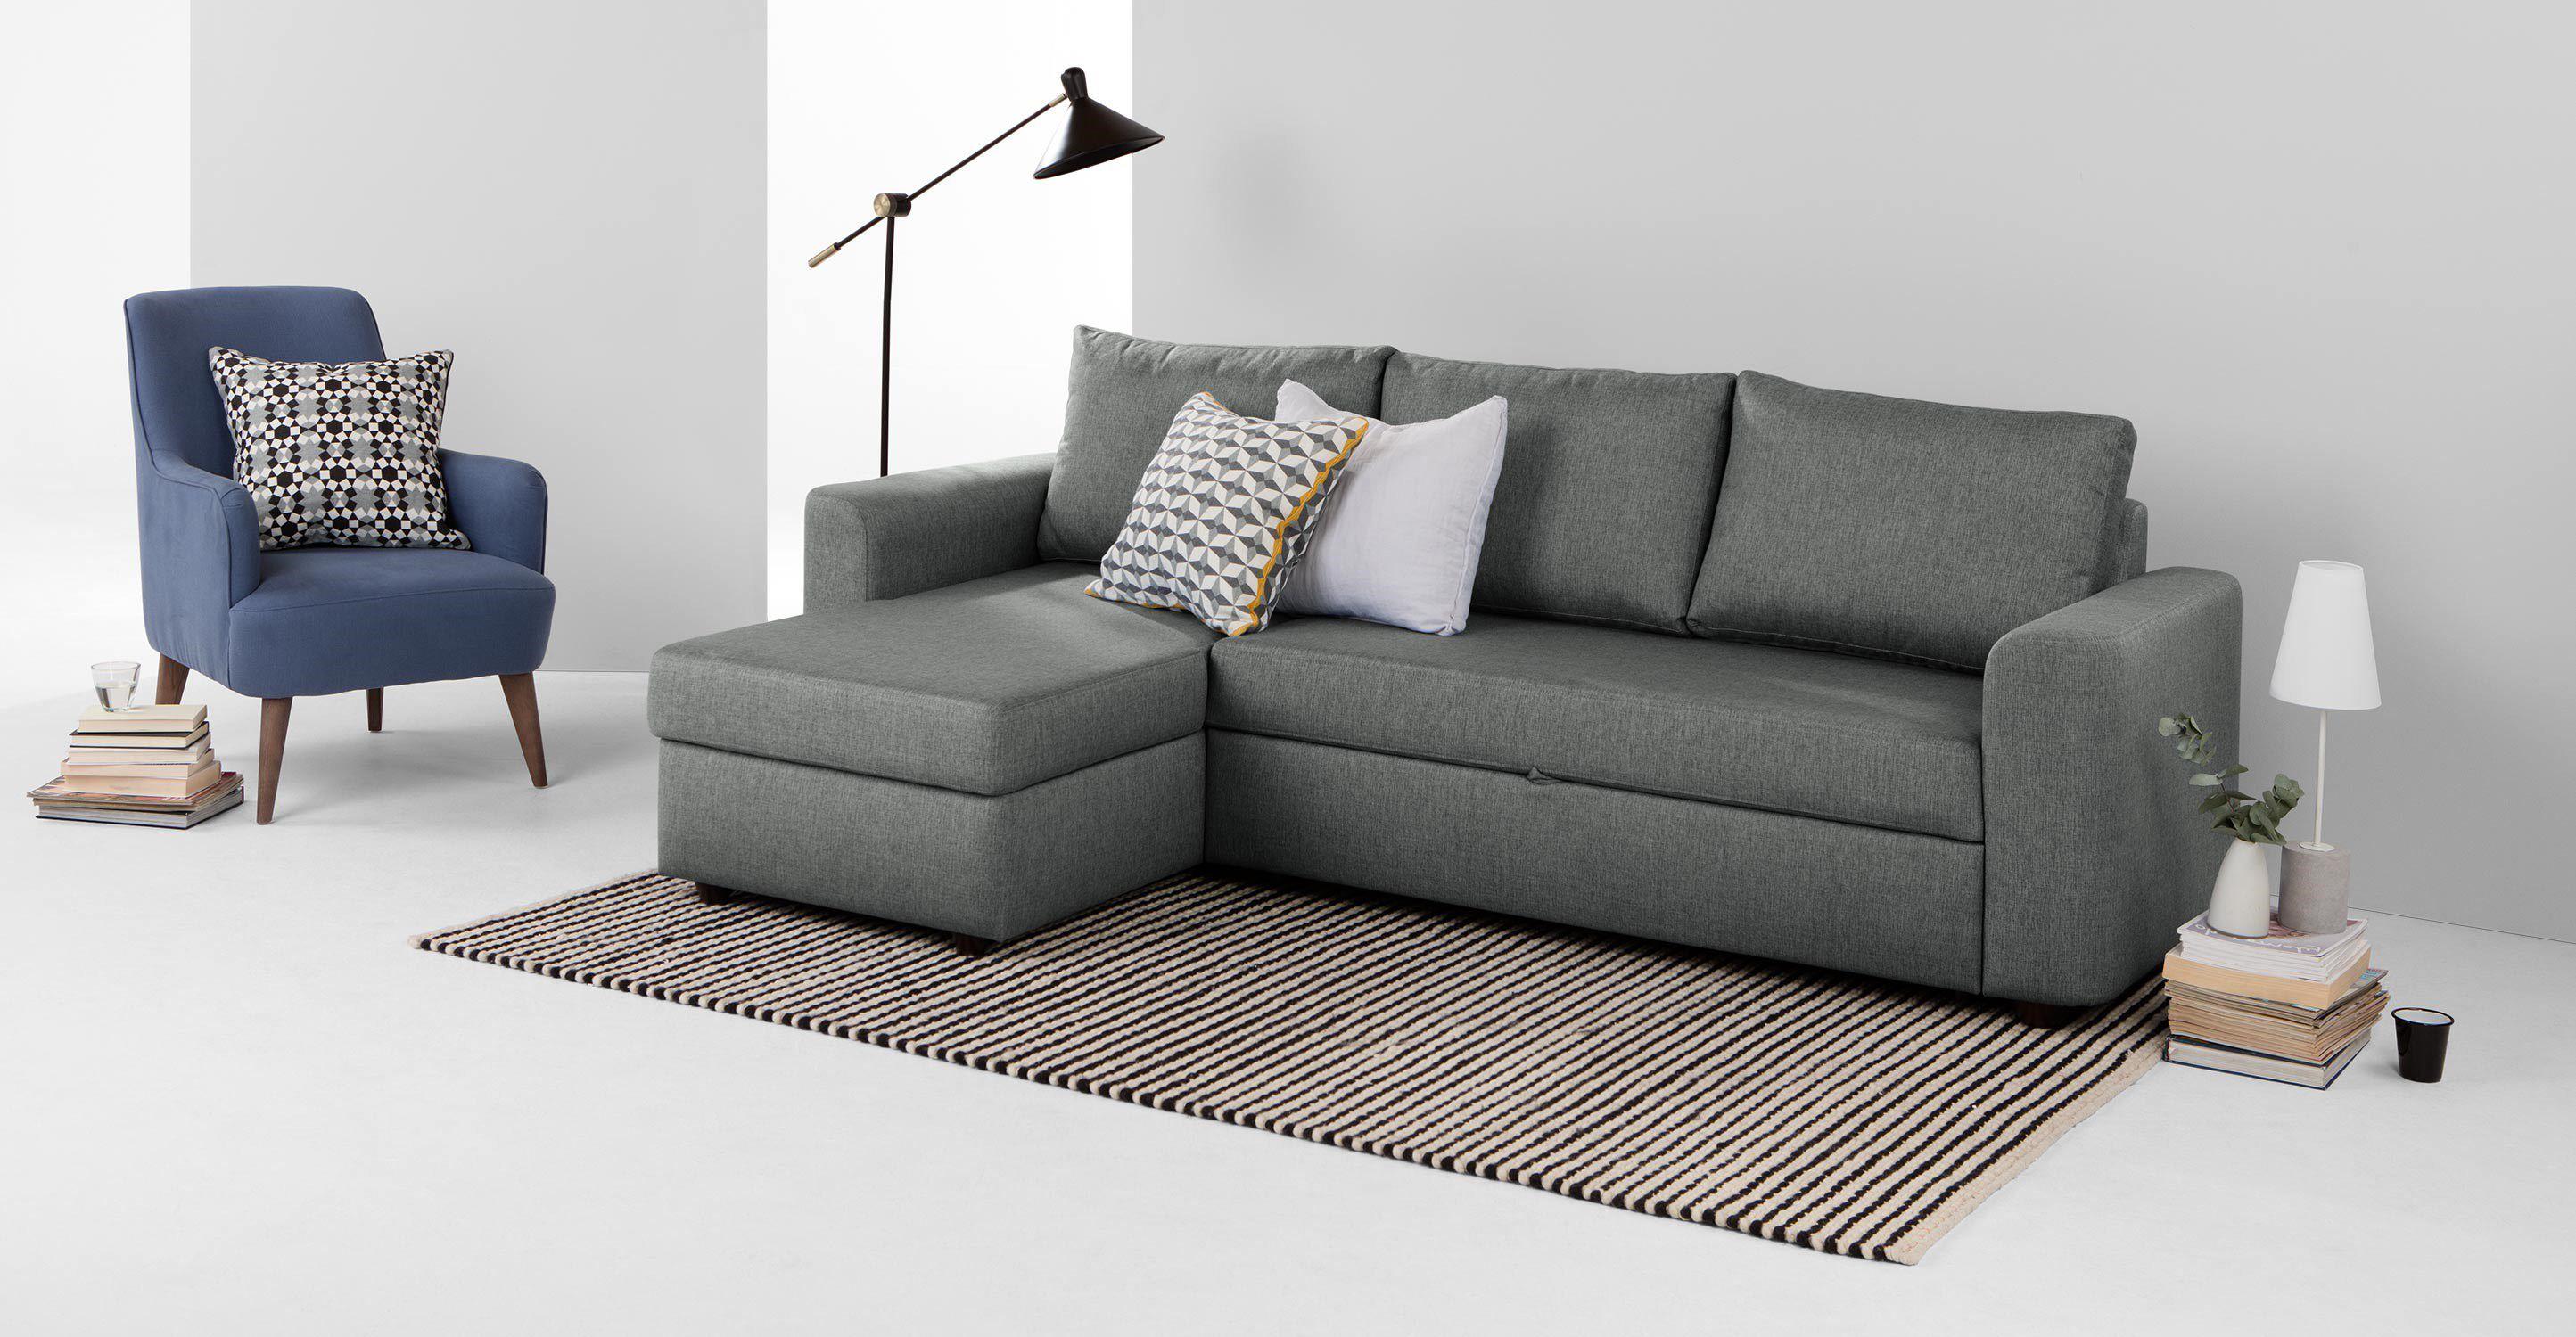 Pin de Catherine Hulme en living room